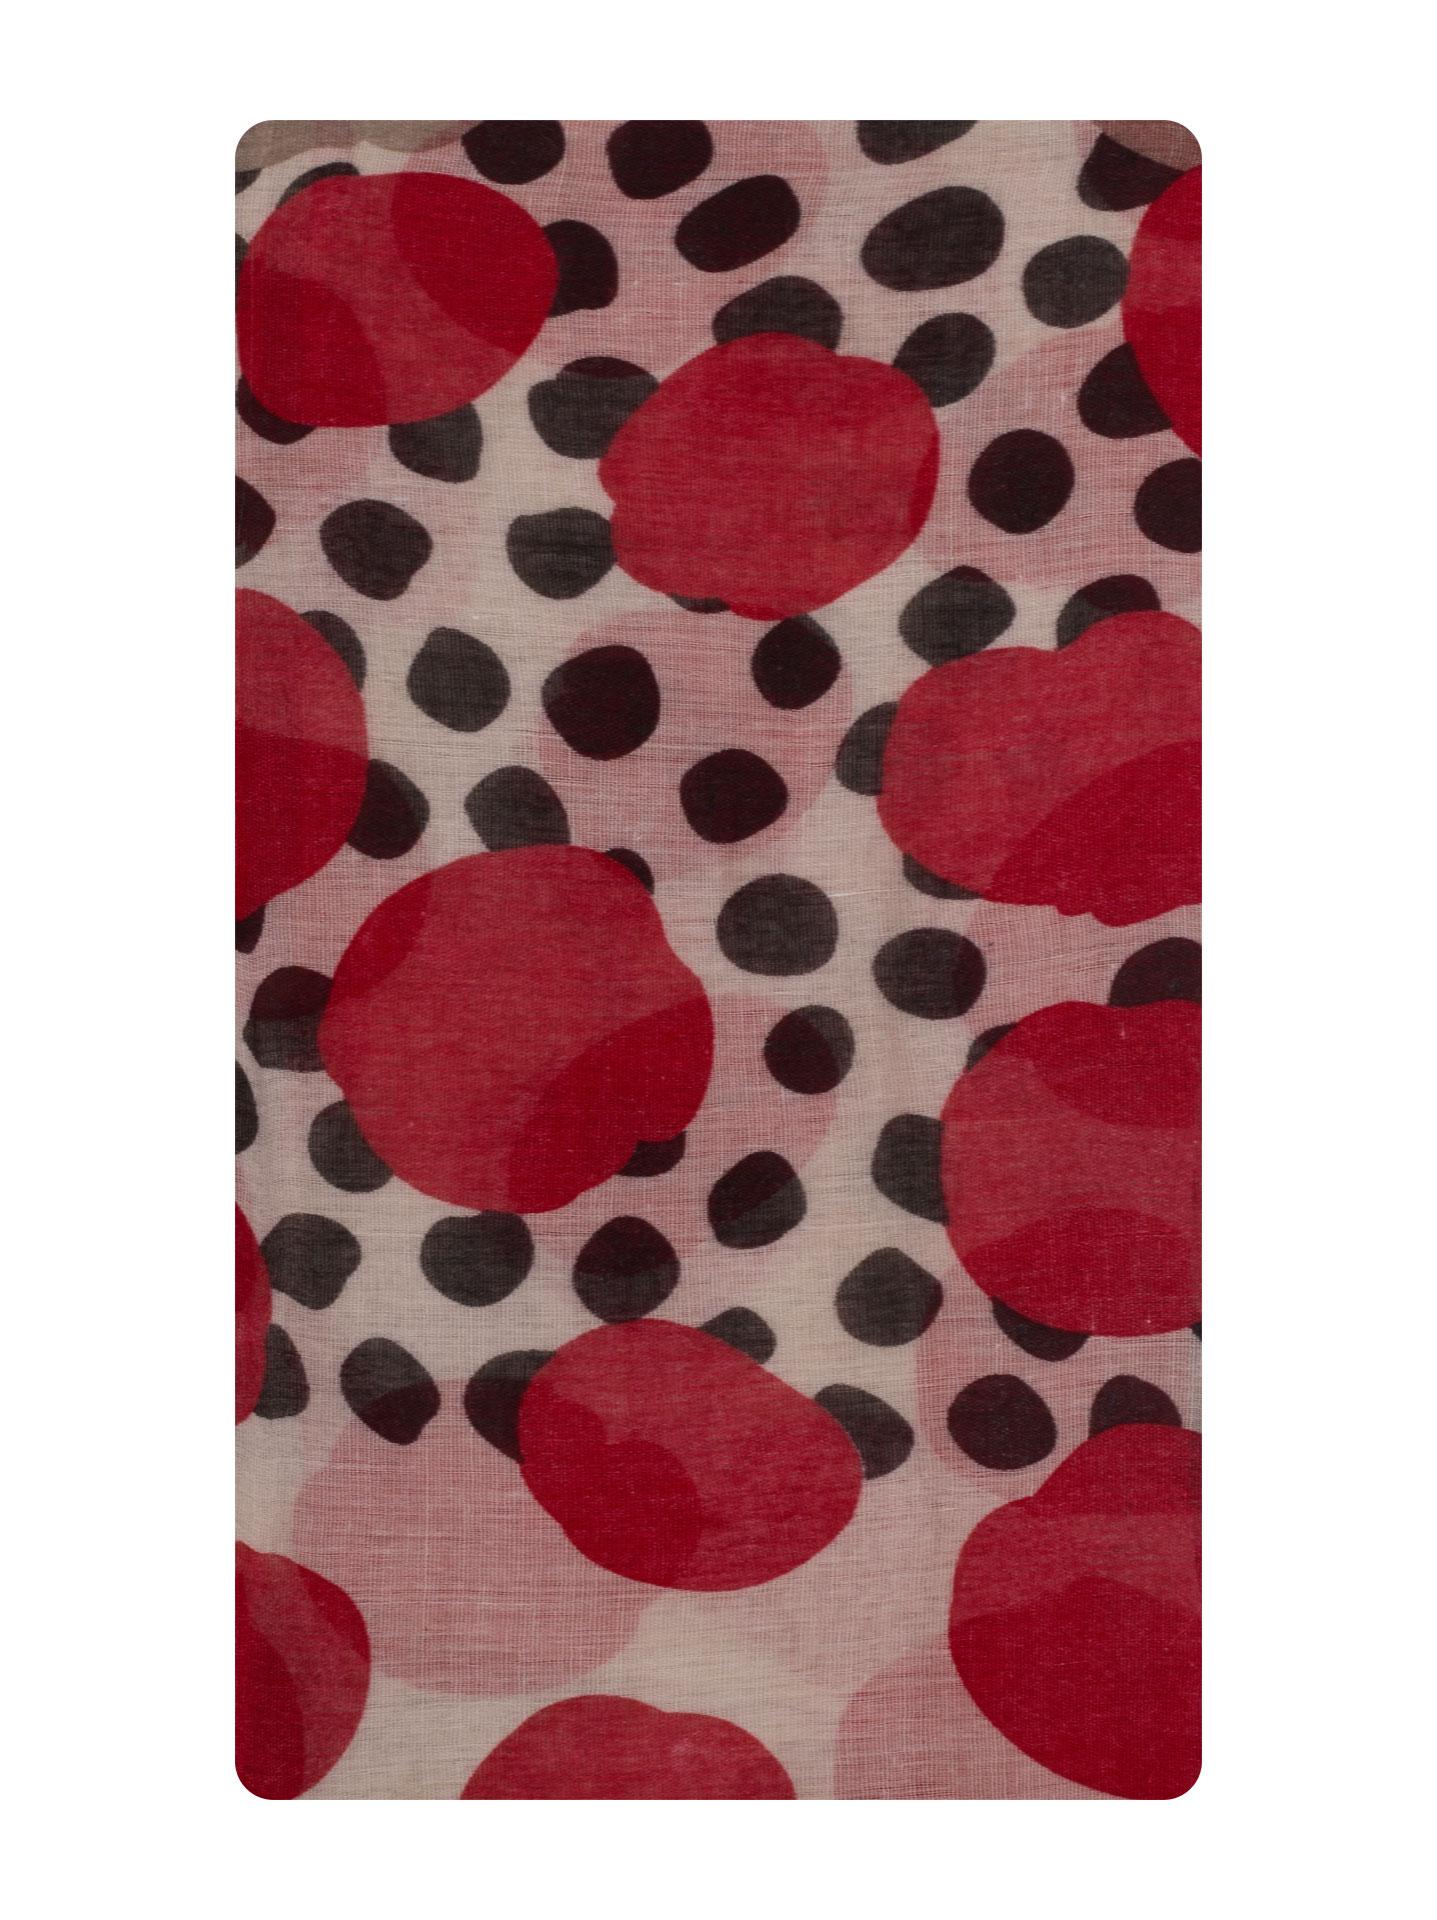 ce4b8b985441 Polka dot scarf in light brown